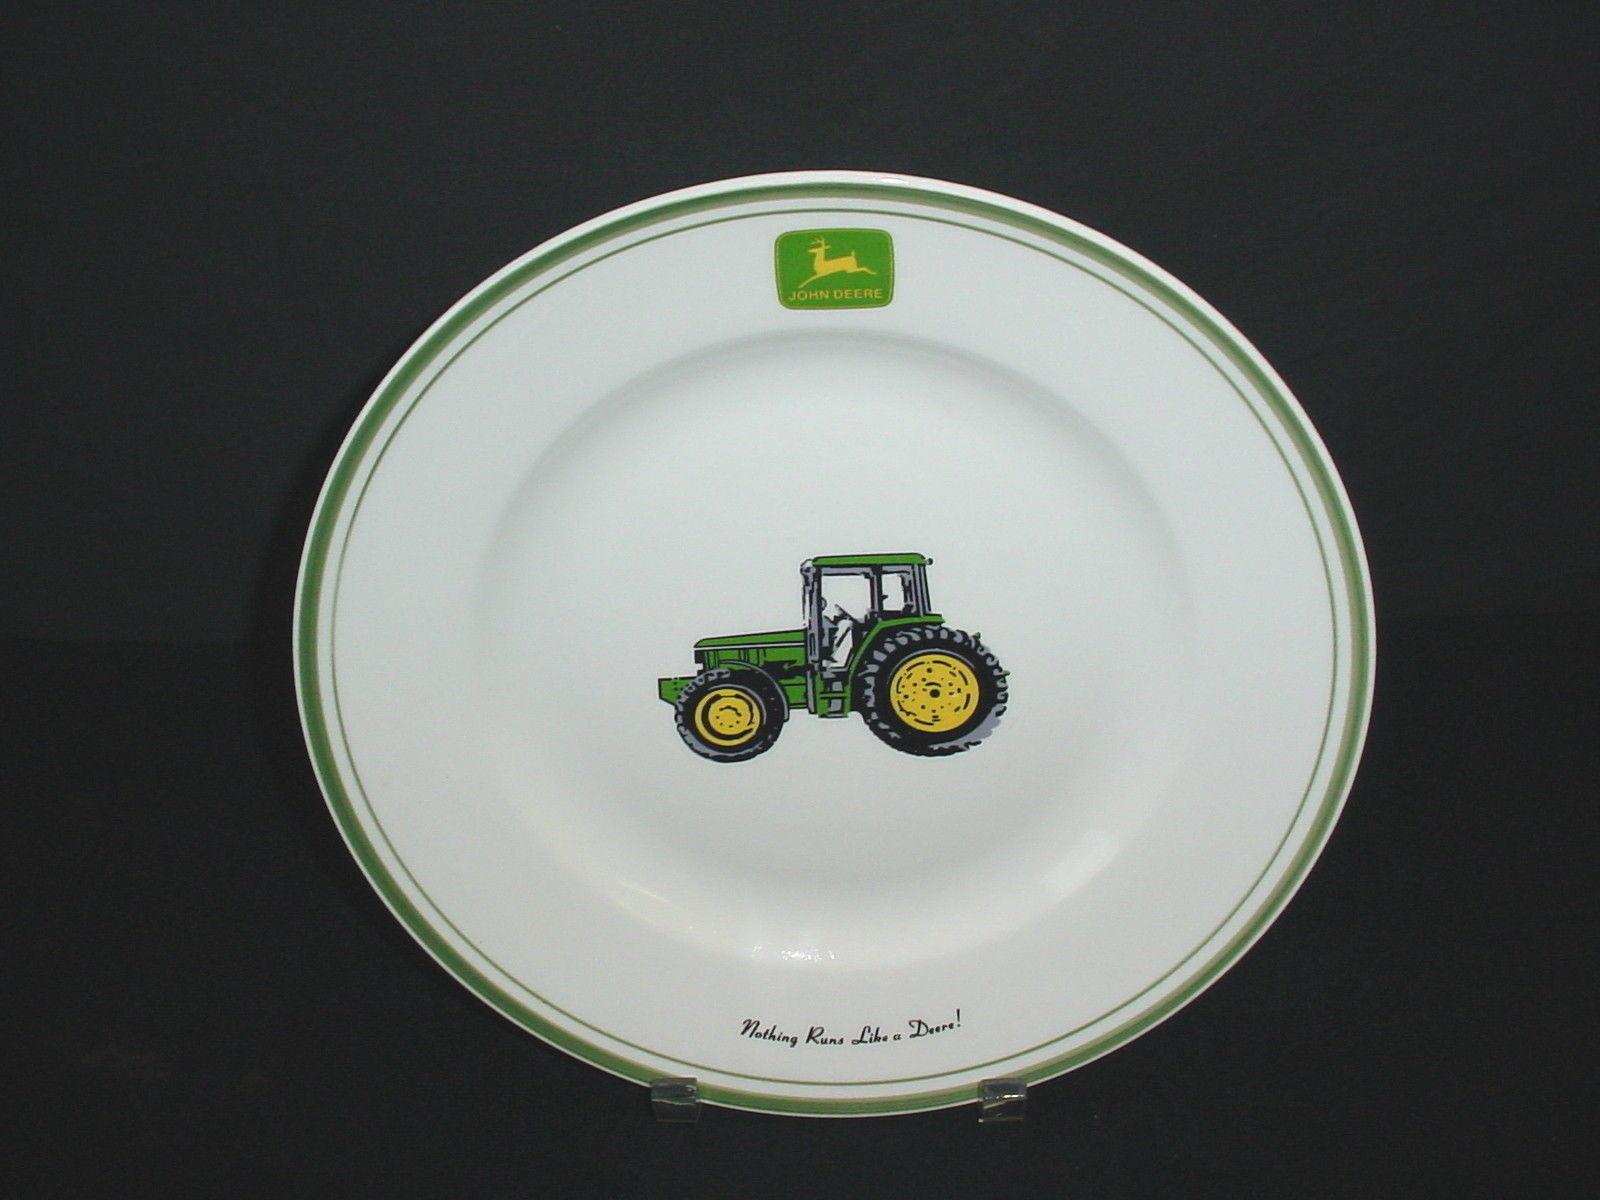 John Deere Tractor Nothing Runs Like a Deere Gibson Dinner ...